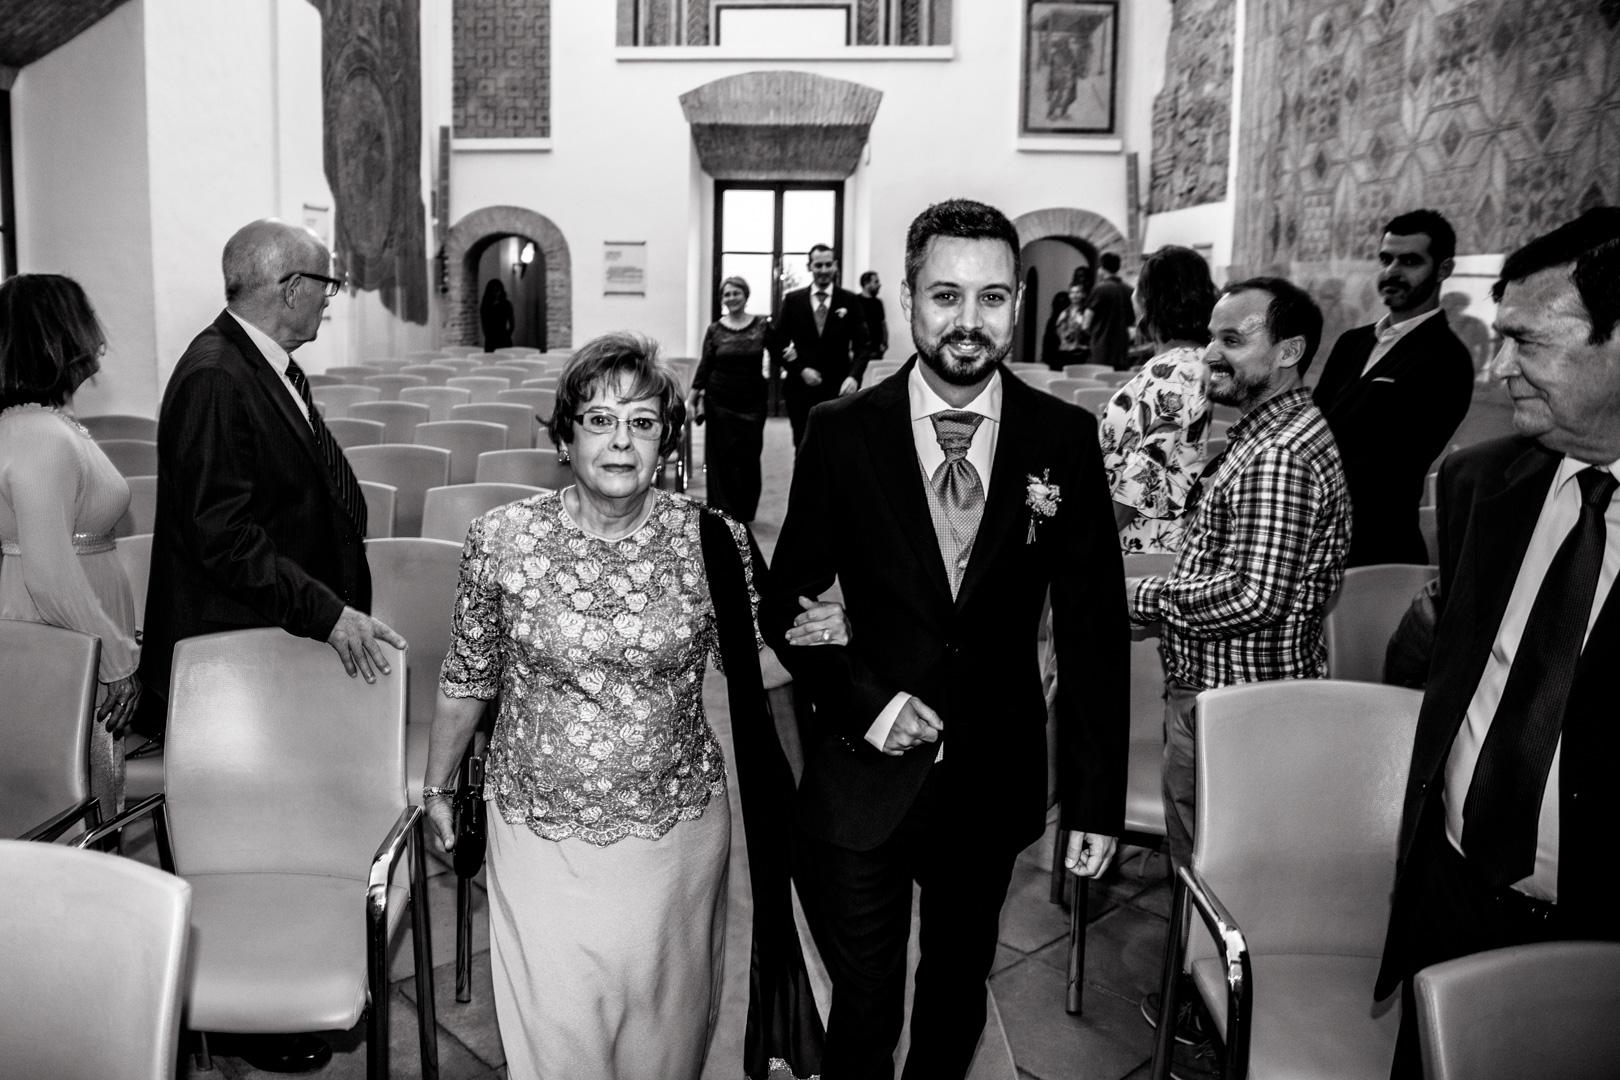 Boda Alcázar Córdoba. Carlos Pavón Fotografía 600257783 (42).jpg